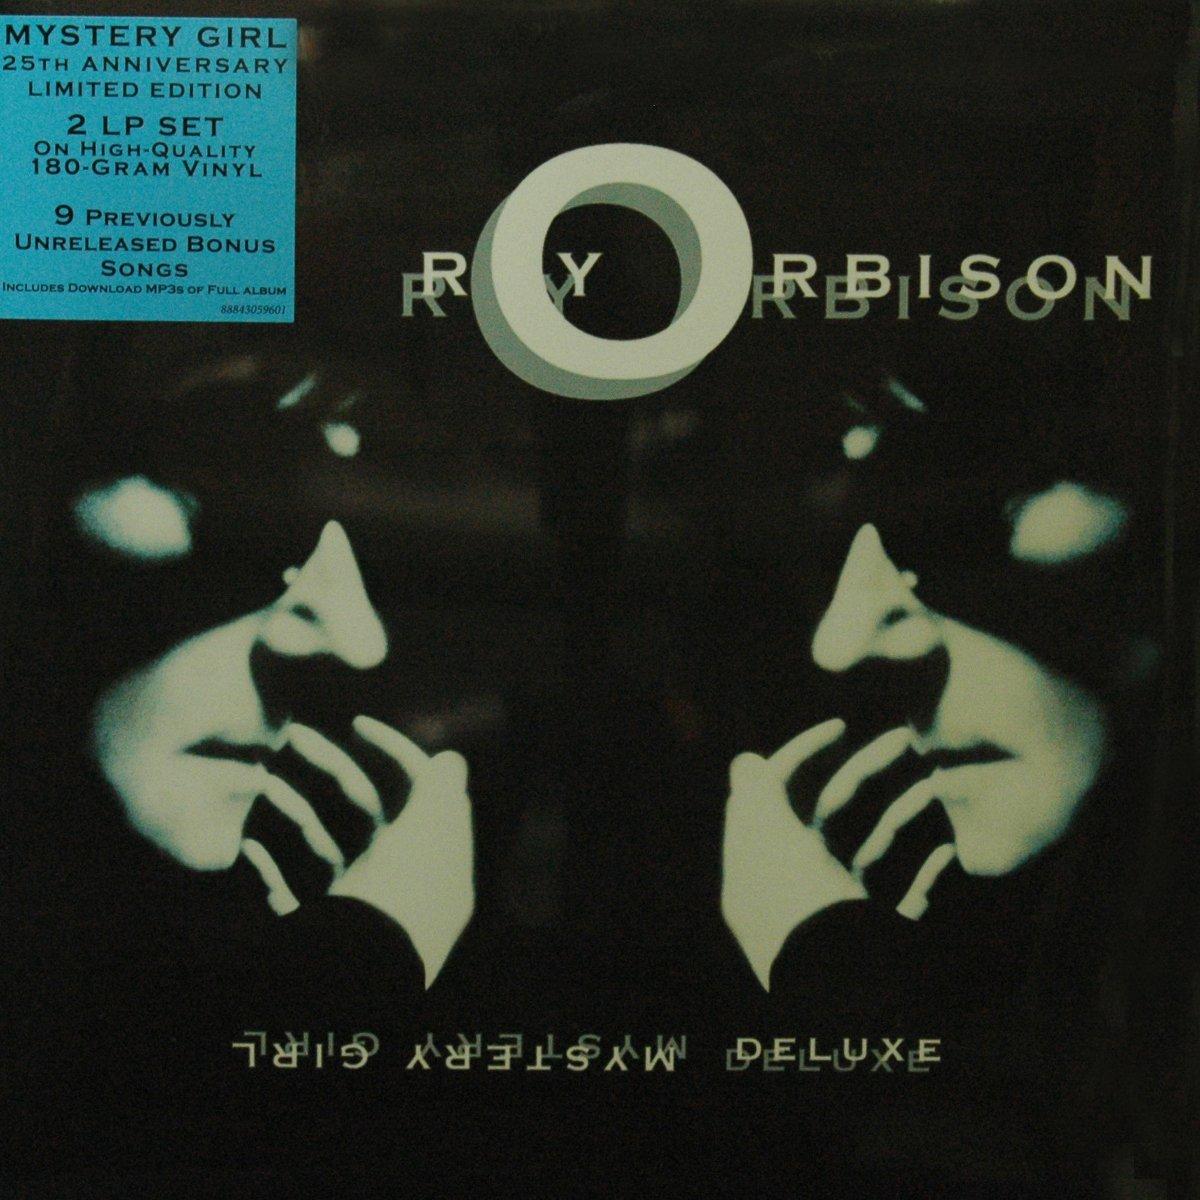 Vinilo : Roy Orbison - Mystery Girl (180 Gram Vinyl, Expanded Version, Deluxe Edition, 2PC)